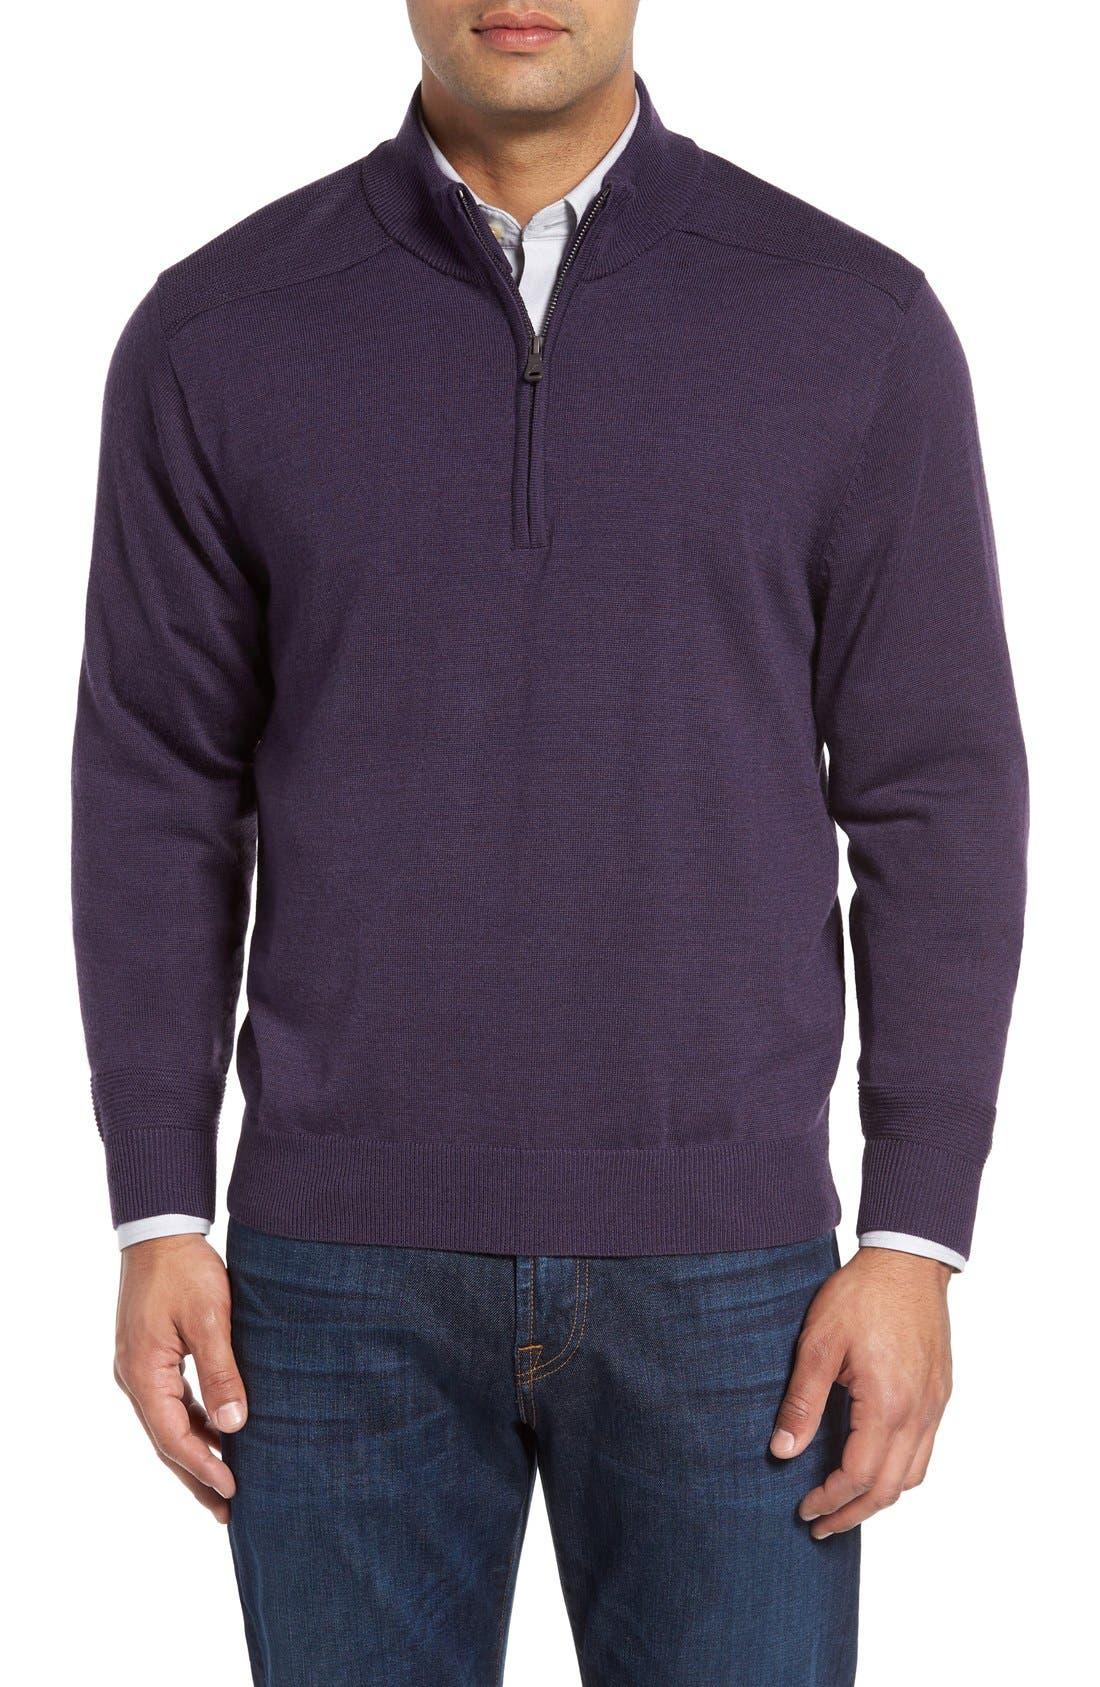 Douglas Quarter Zip Wool Blend Sweater,                         Main,                         color, Charade Heather